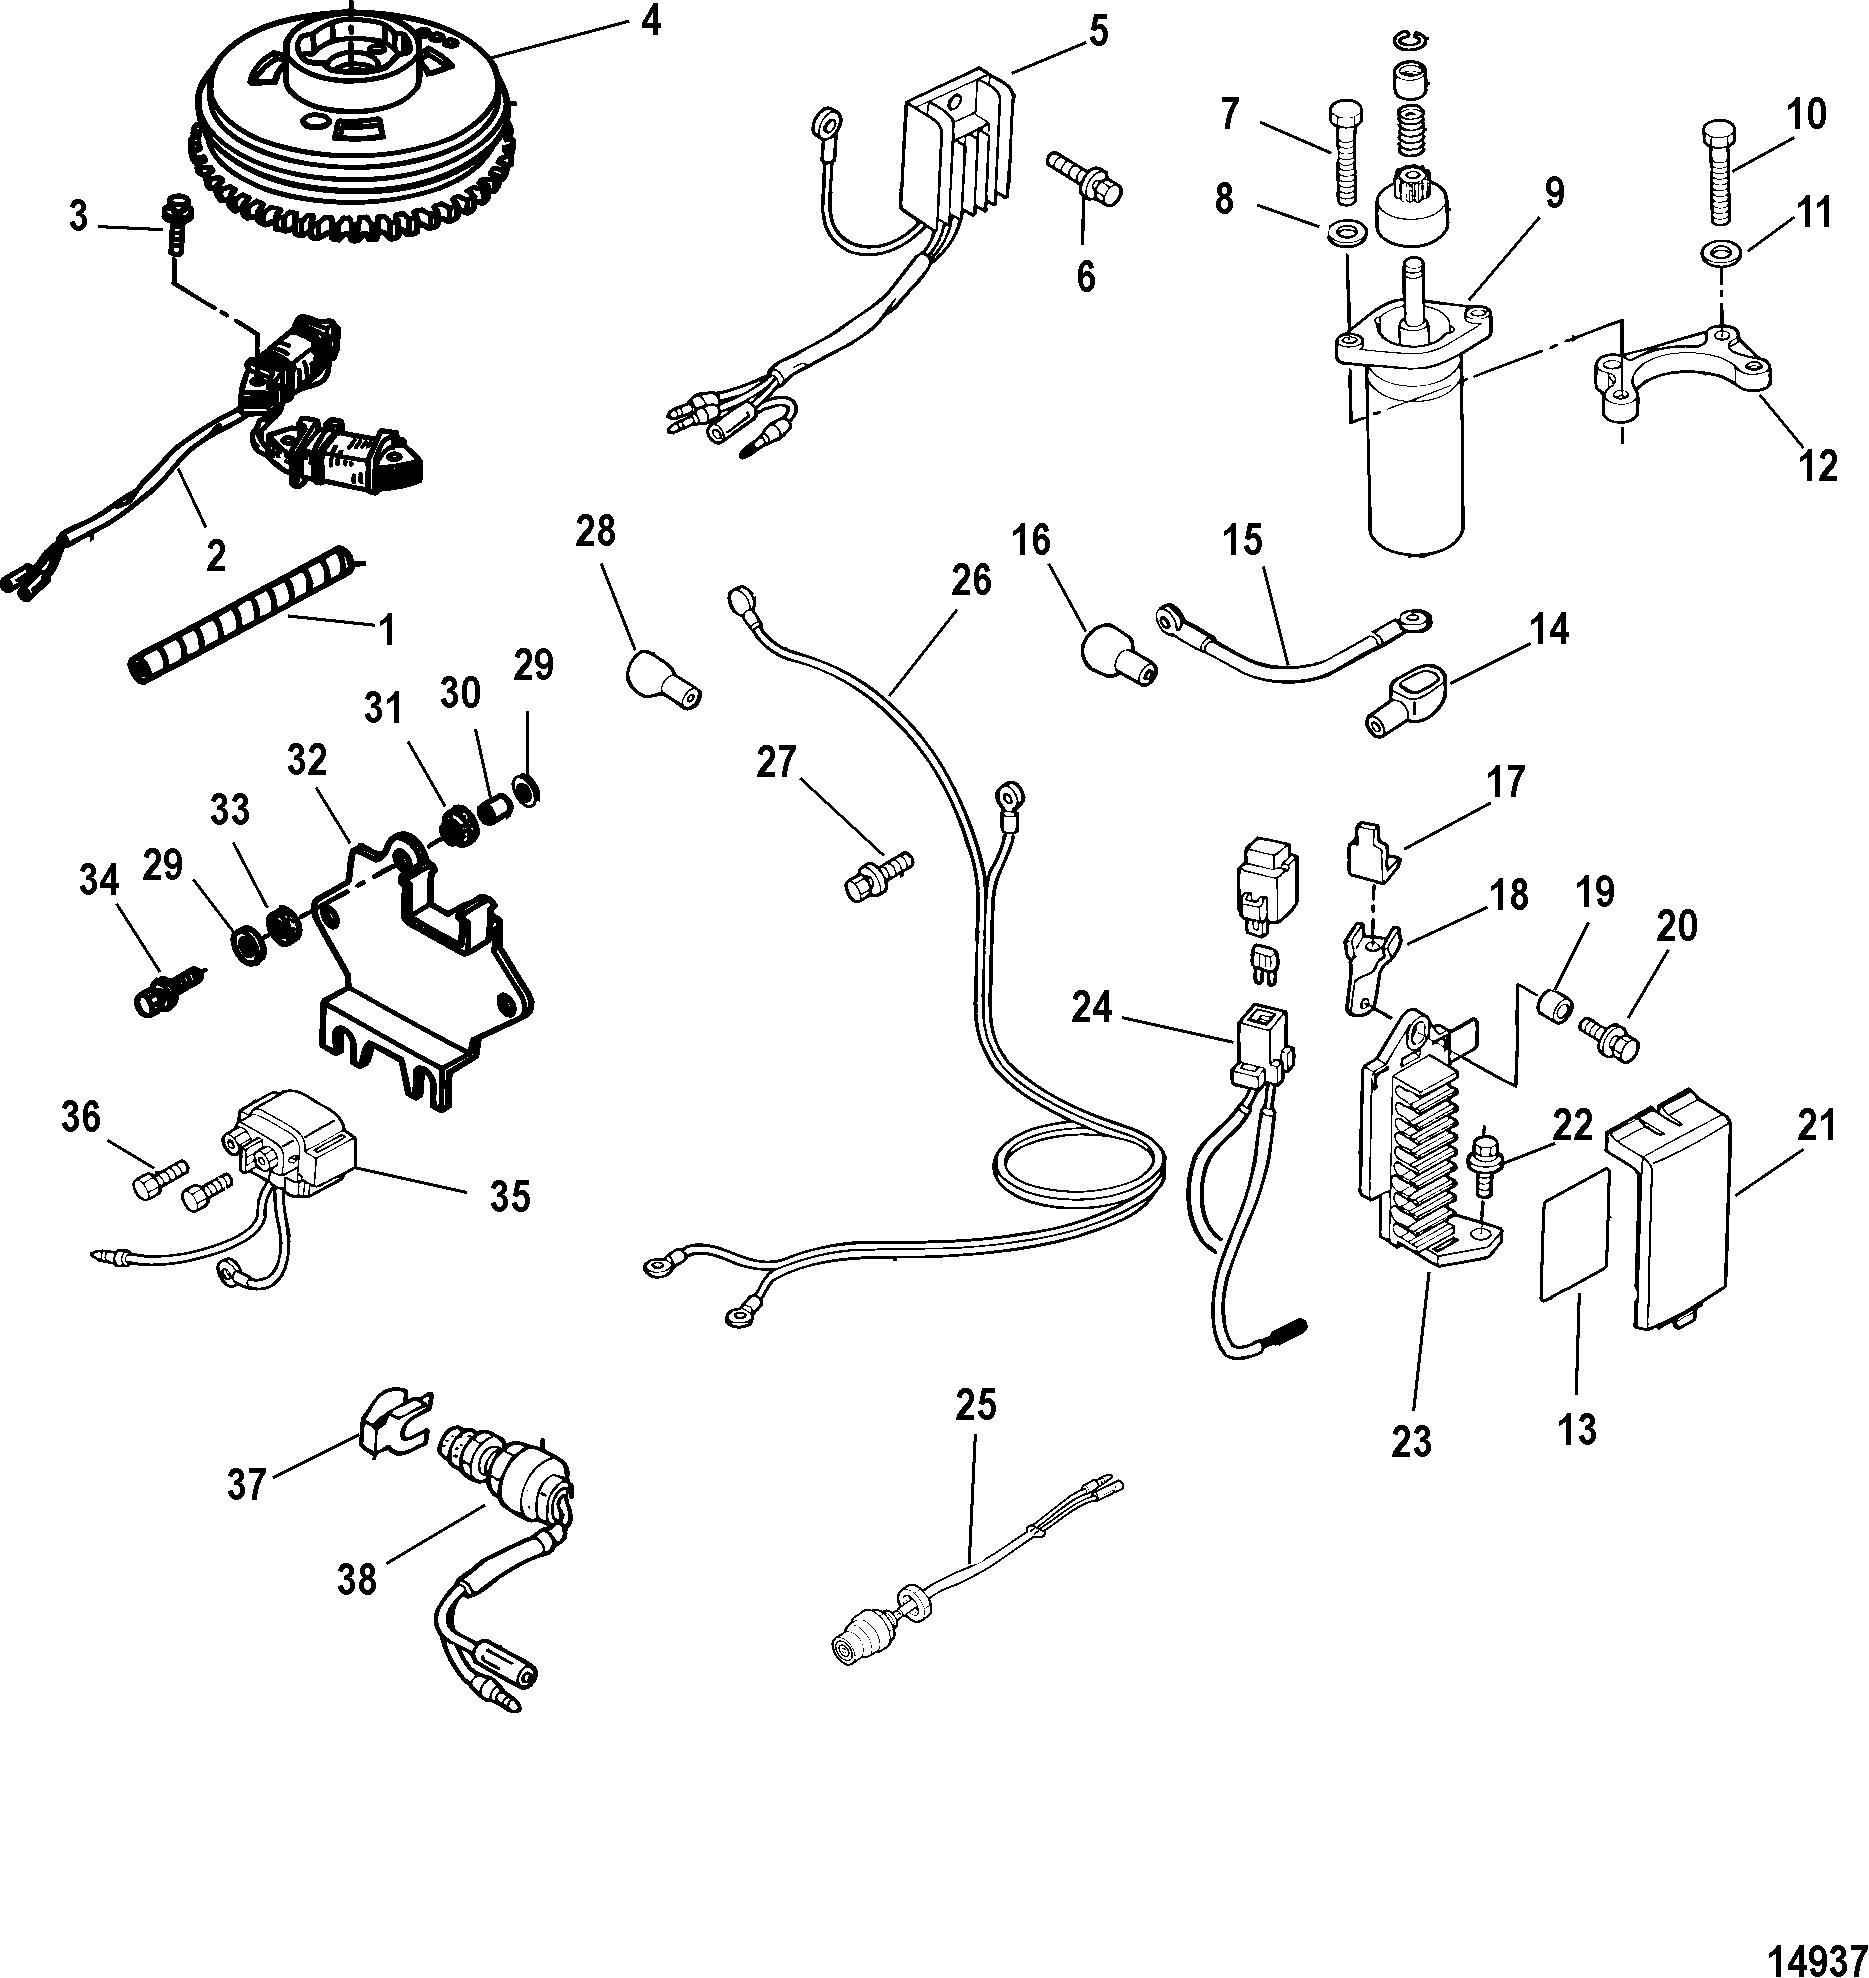 mariner outboard engine wiring diagram mercury mariner 9 9  4 stroke  209cc  0r042475   up  mercury mariner 9 9  4 stroke